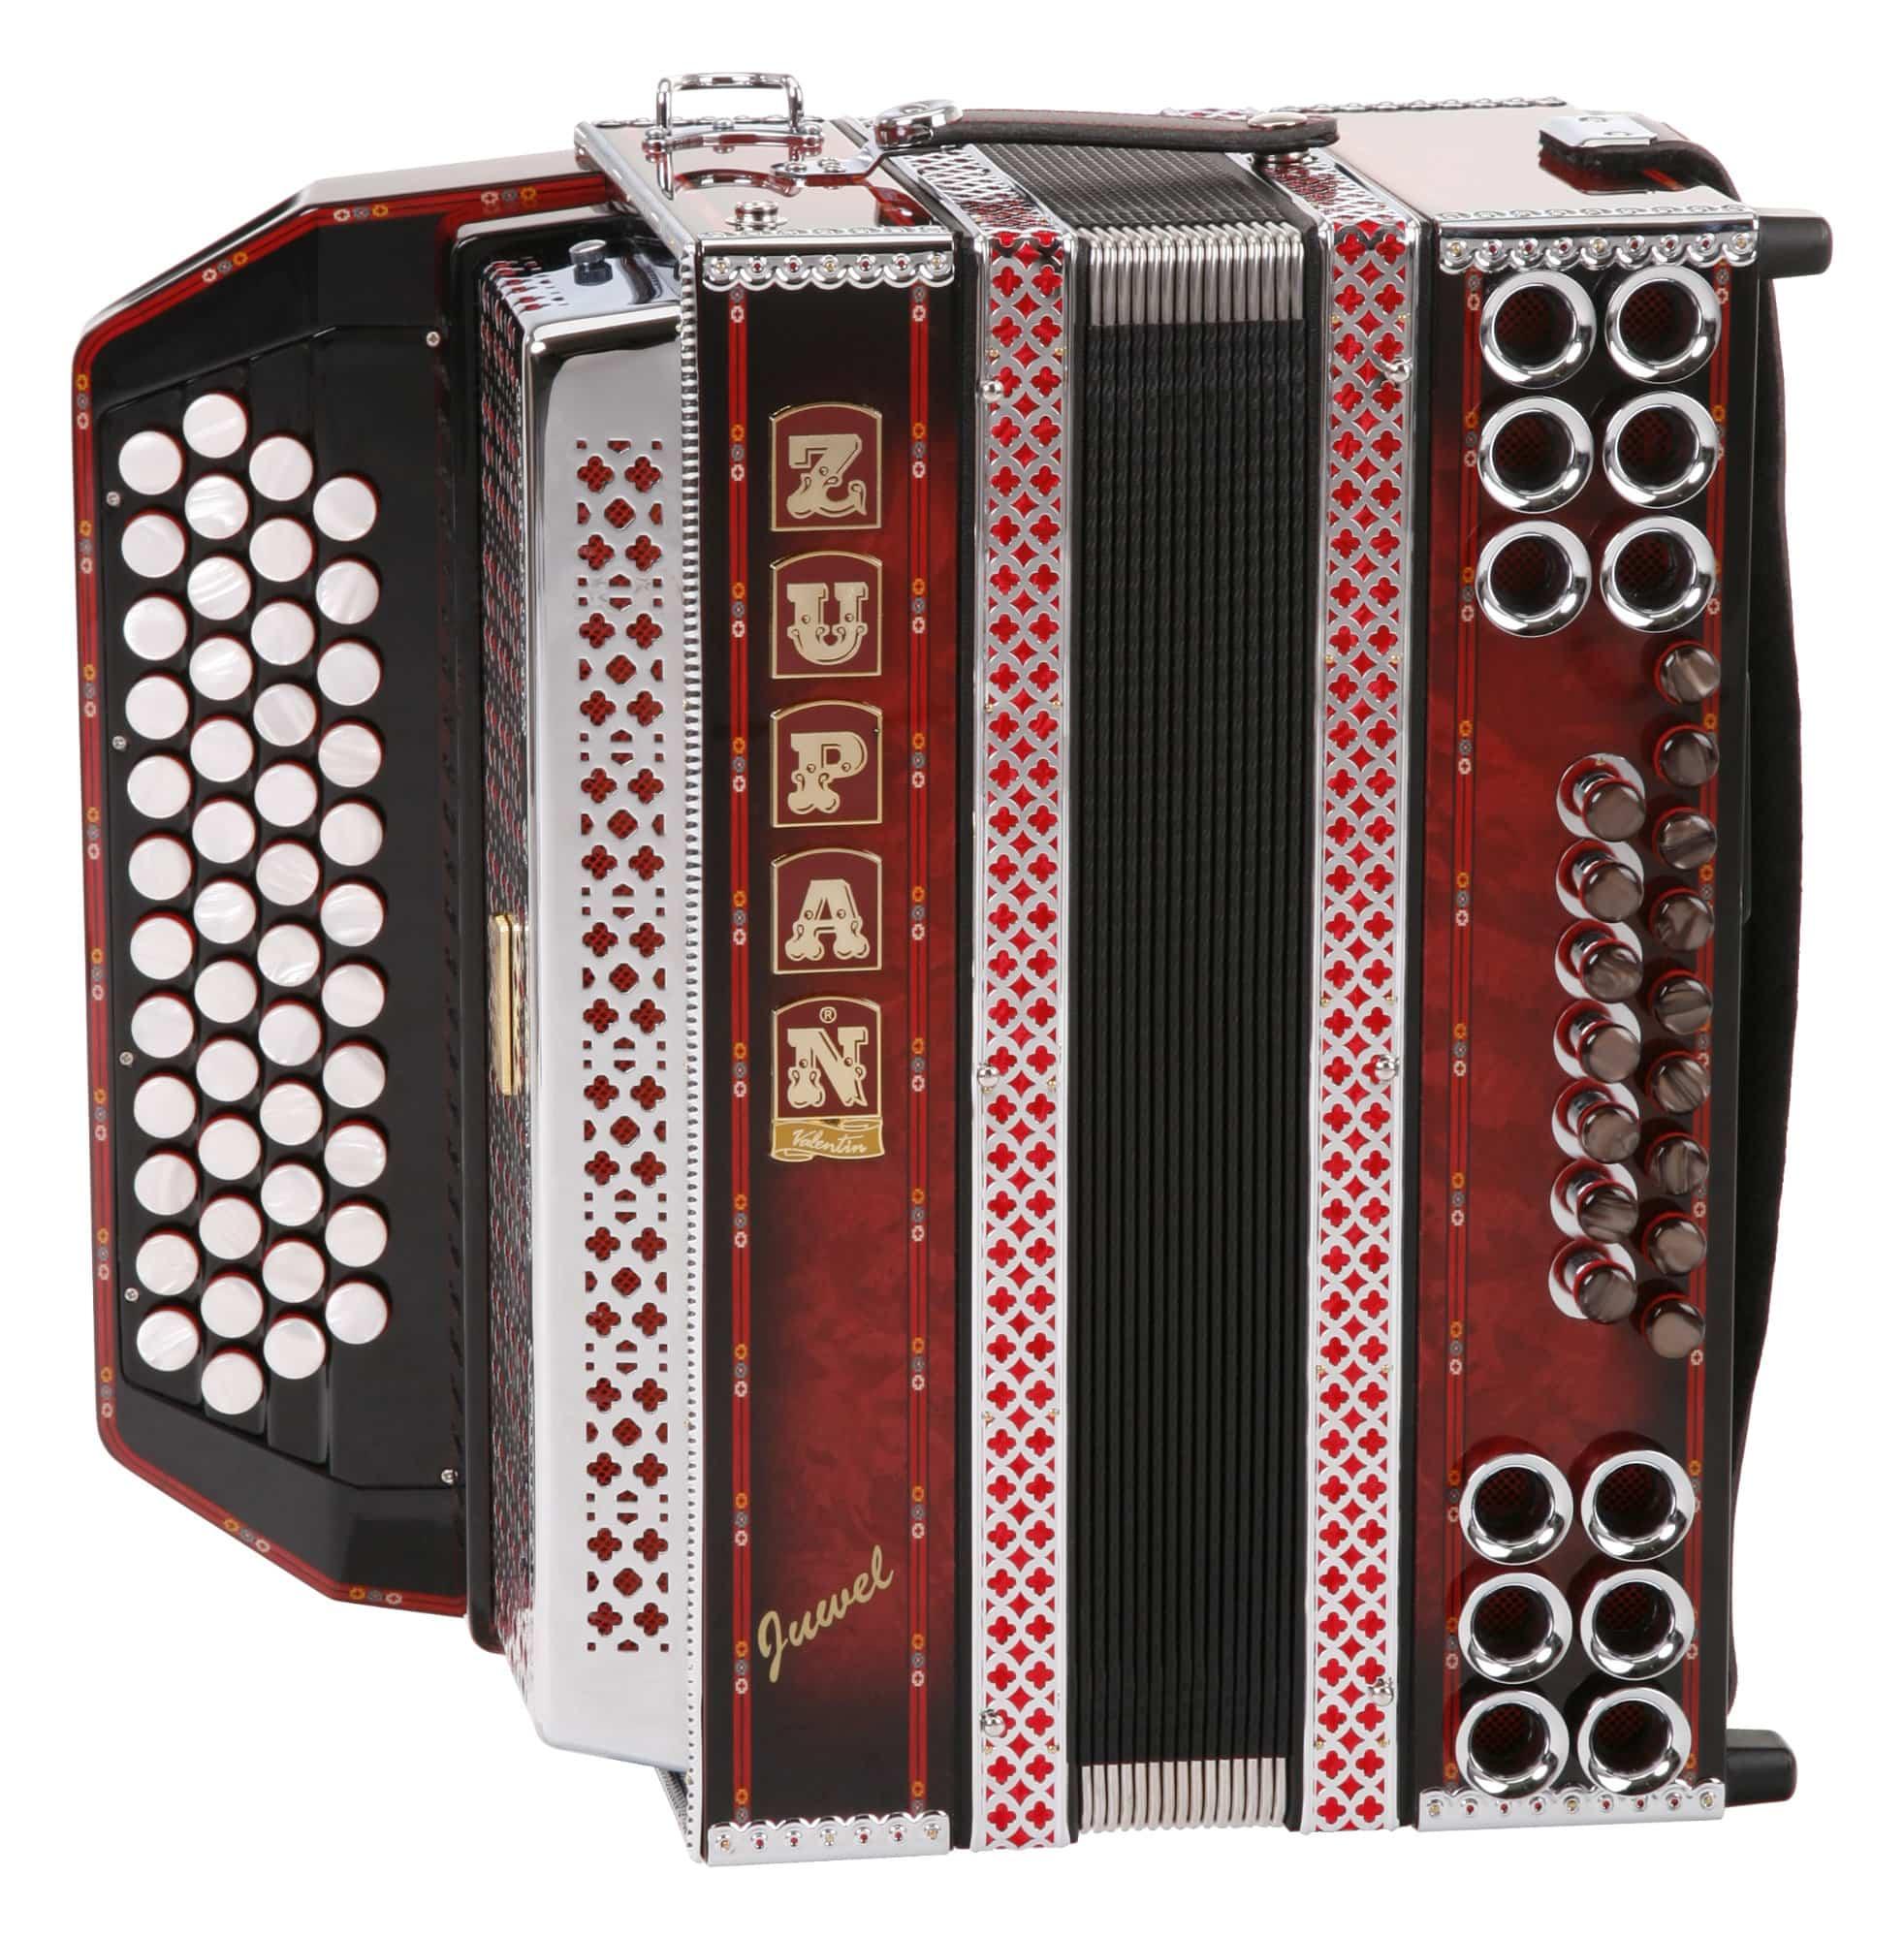 Zupan Juwel IVD Harmonika Shadow Red (G C F B)